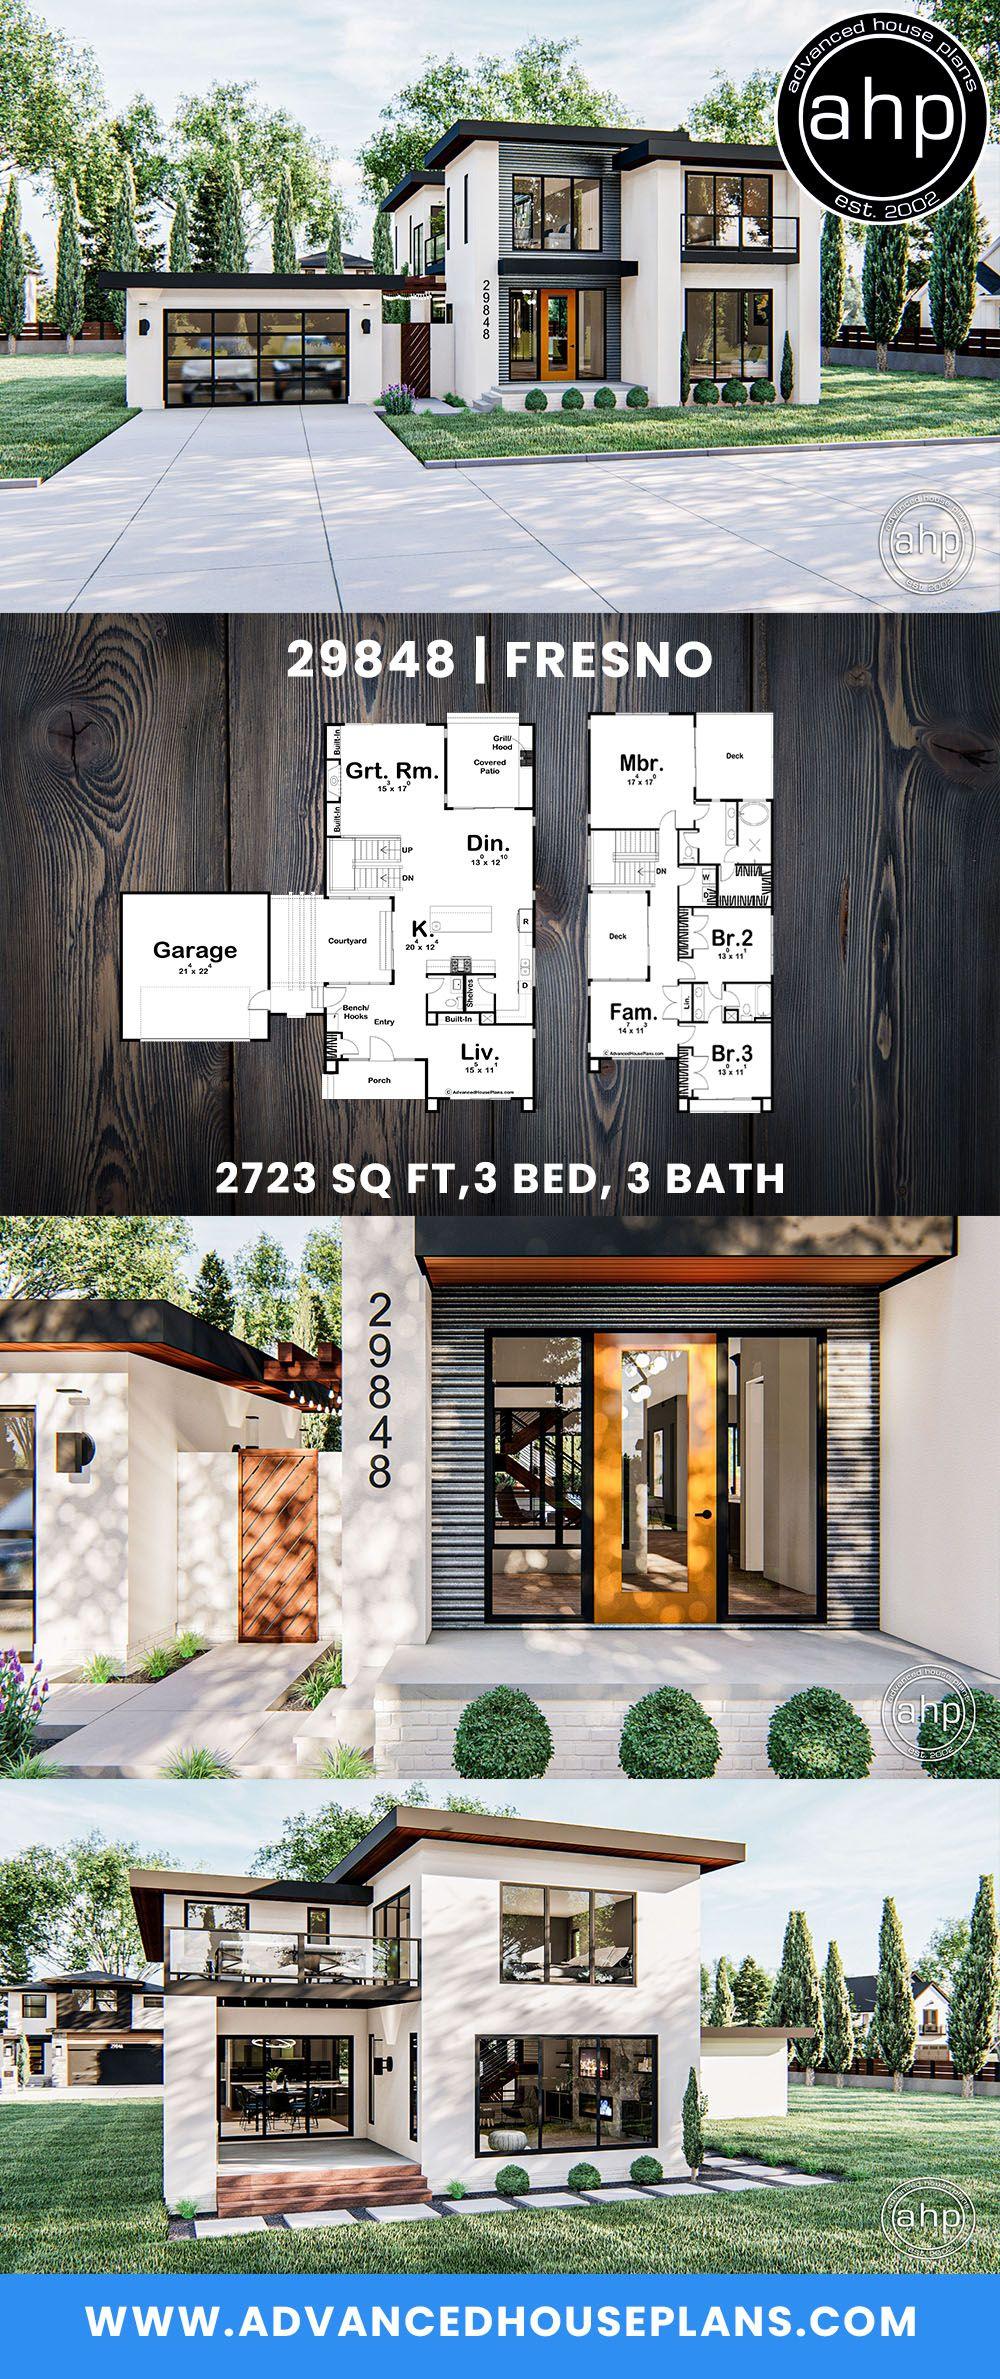 Edgy Modern Home